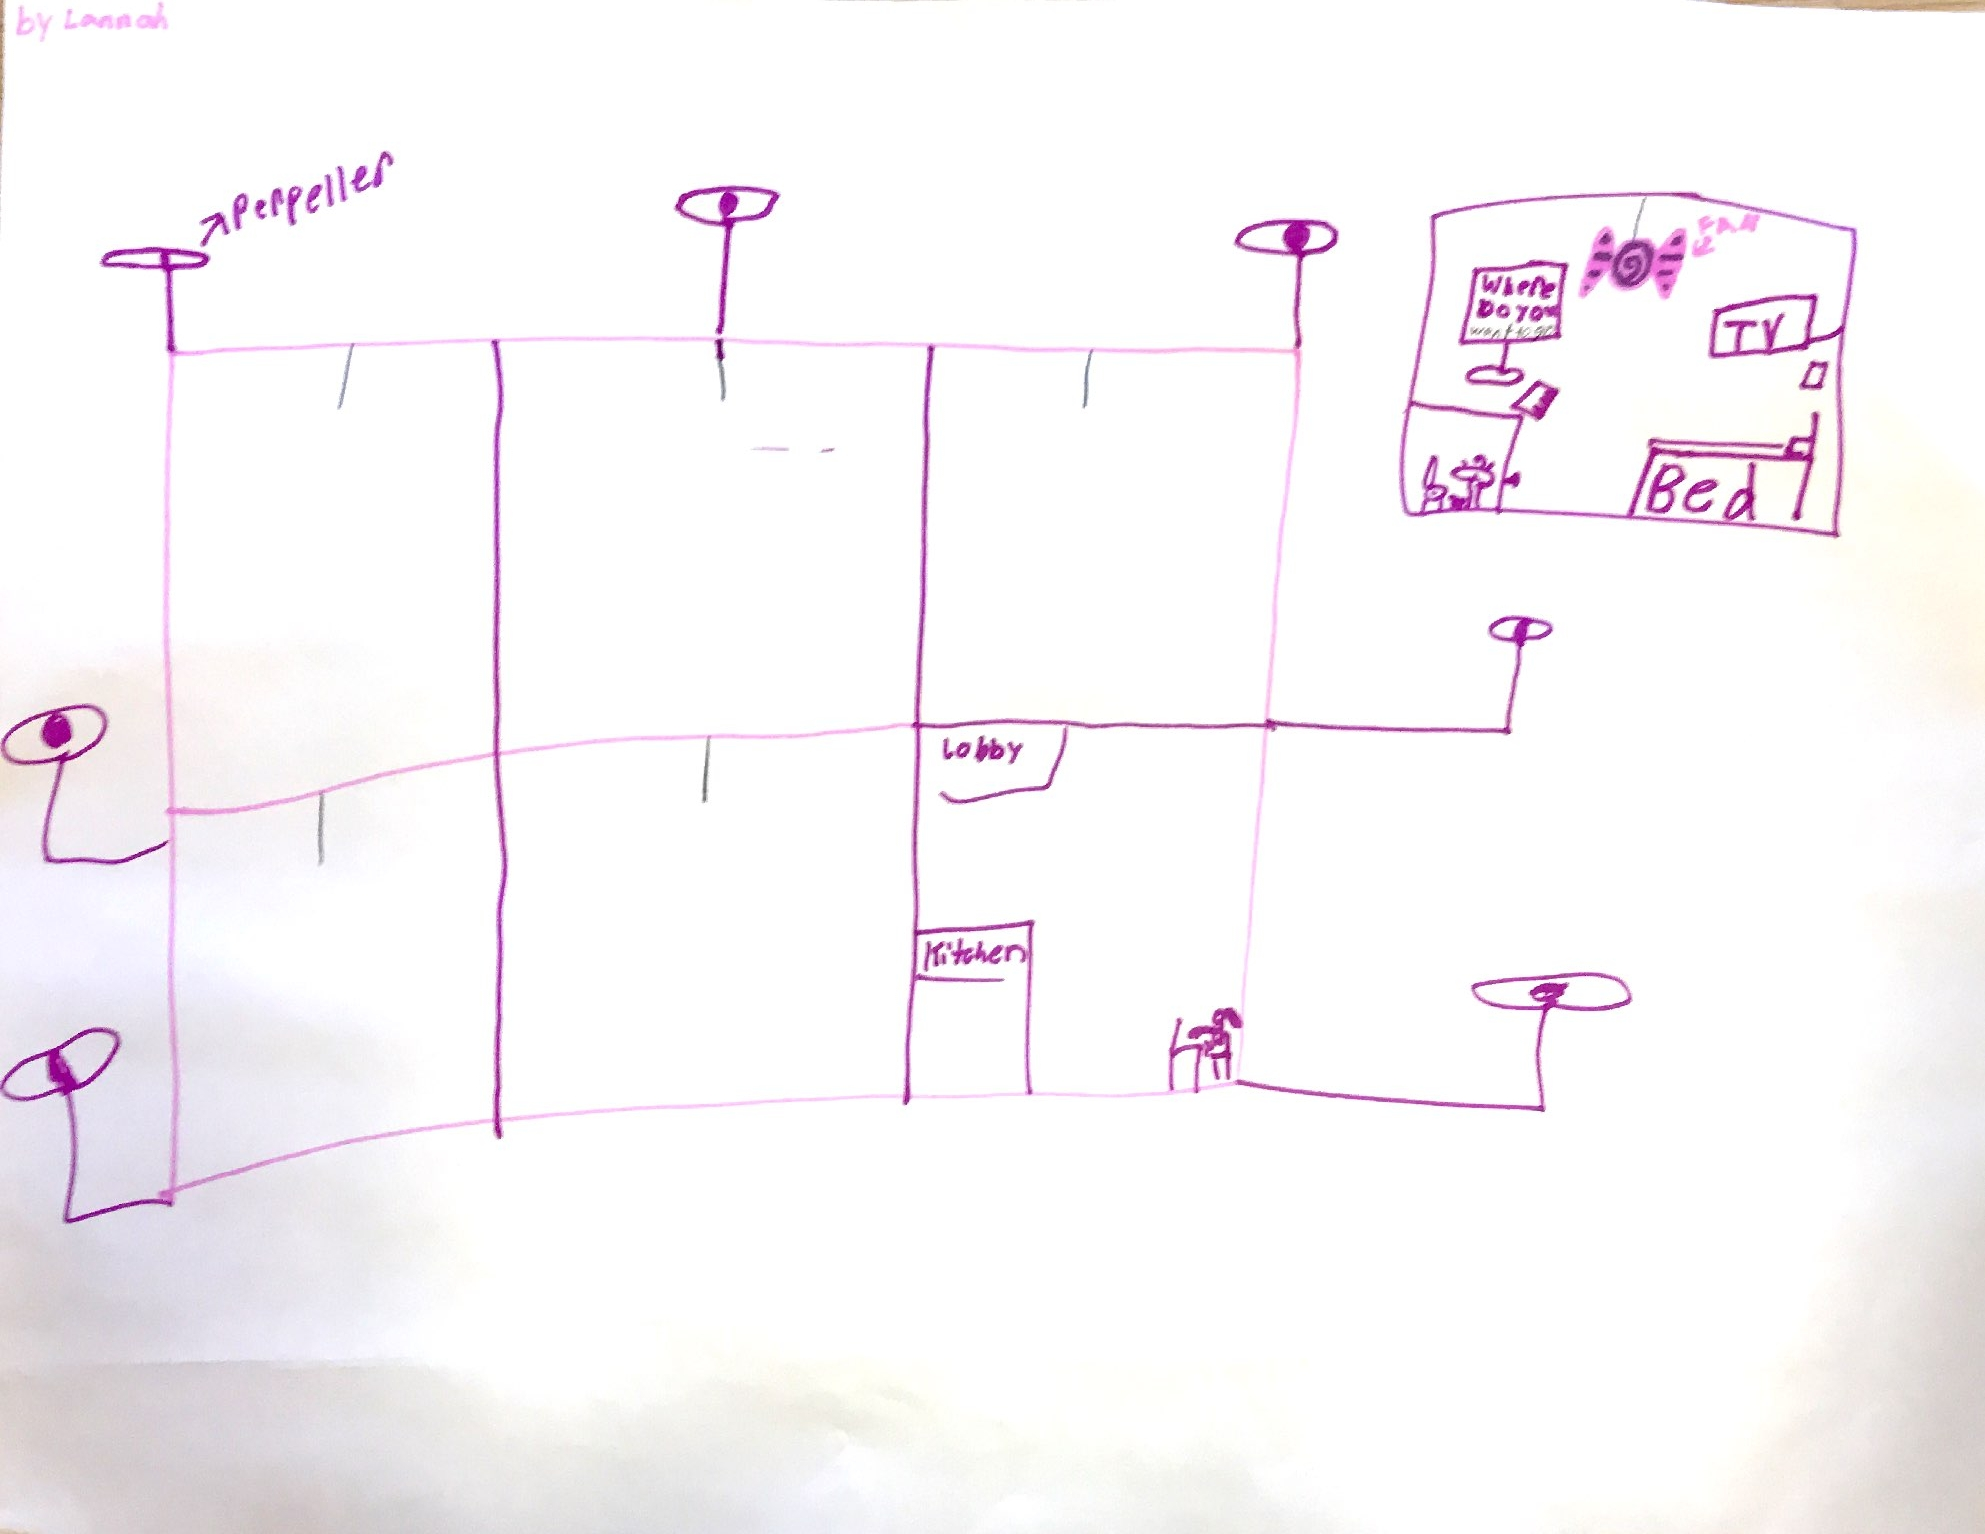 lower El innovation brainstorms-page-2.jpg